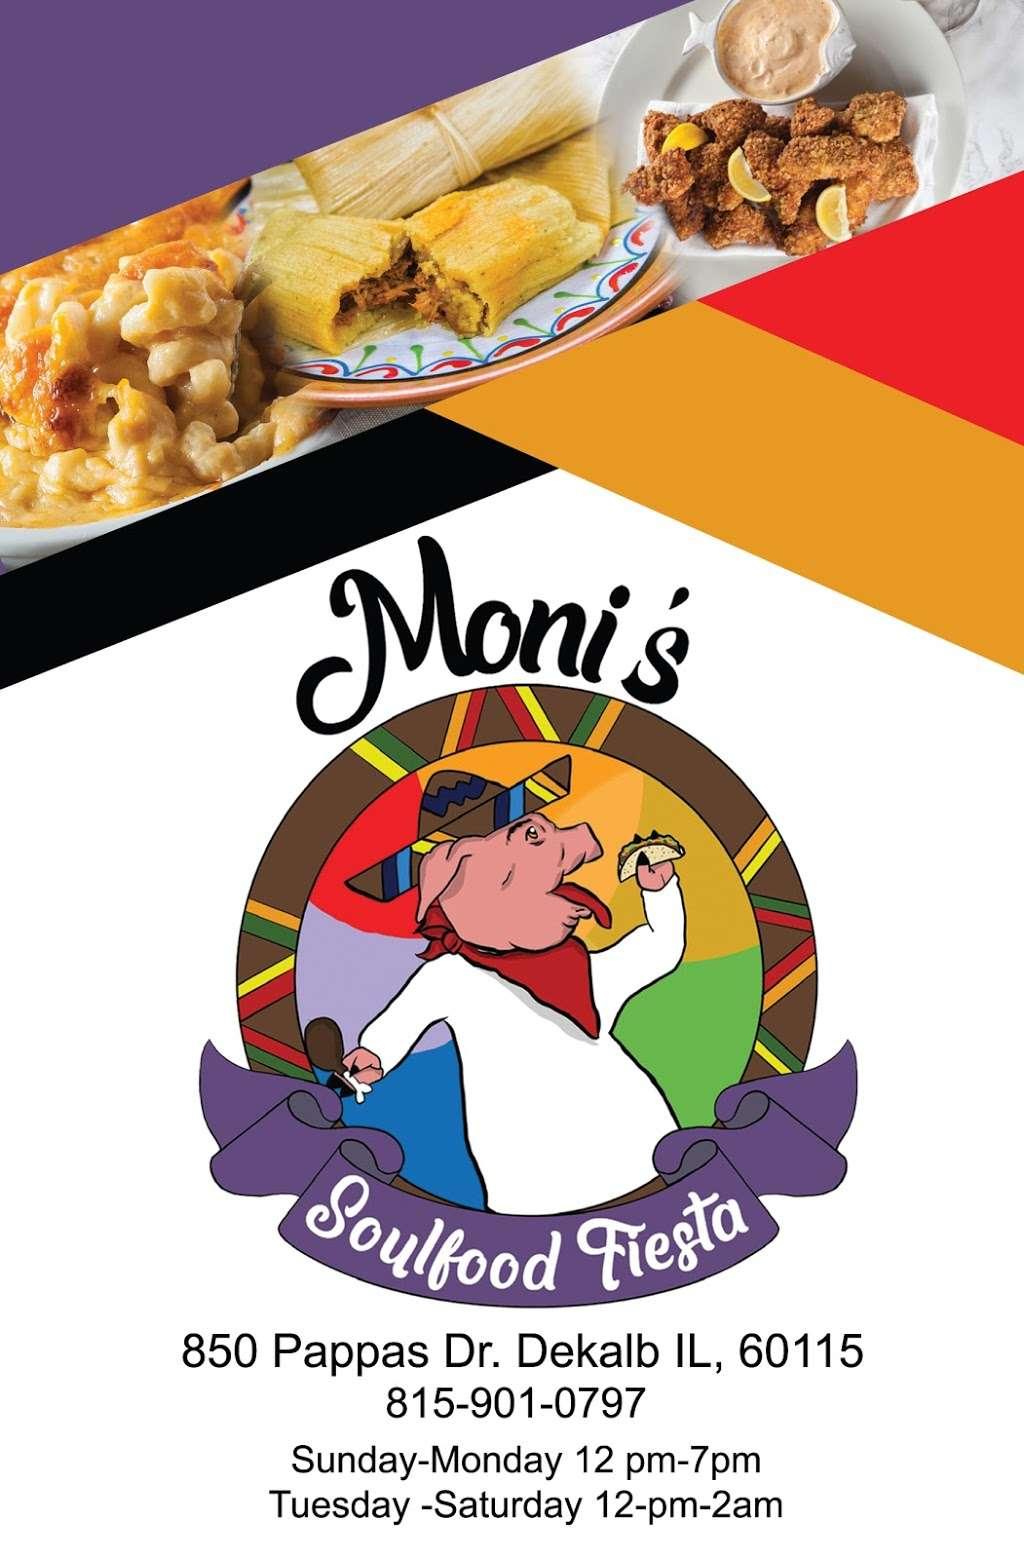 Monis Soulfood Fiesta - restaurant    Photo 5 of 7   Address: 850 Pappas Dr, DeKalb, IL 60115, USA   Phone: (815) 901-0797